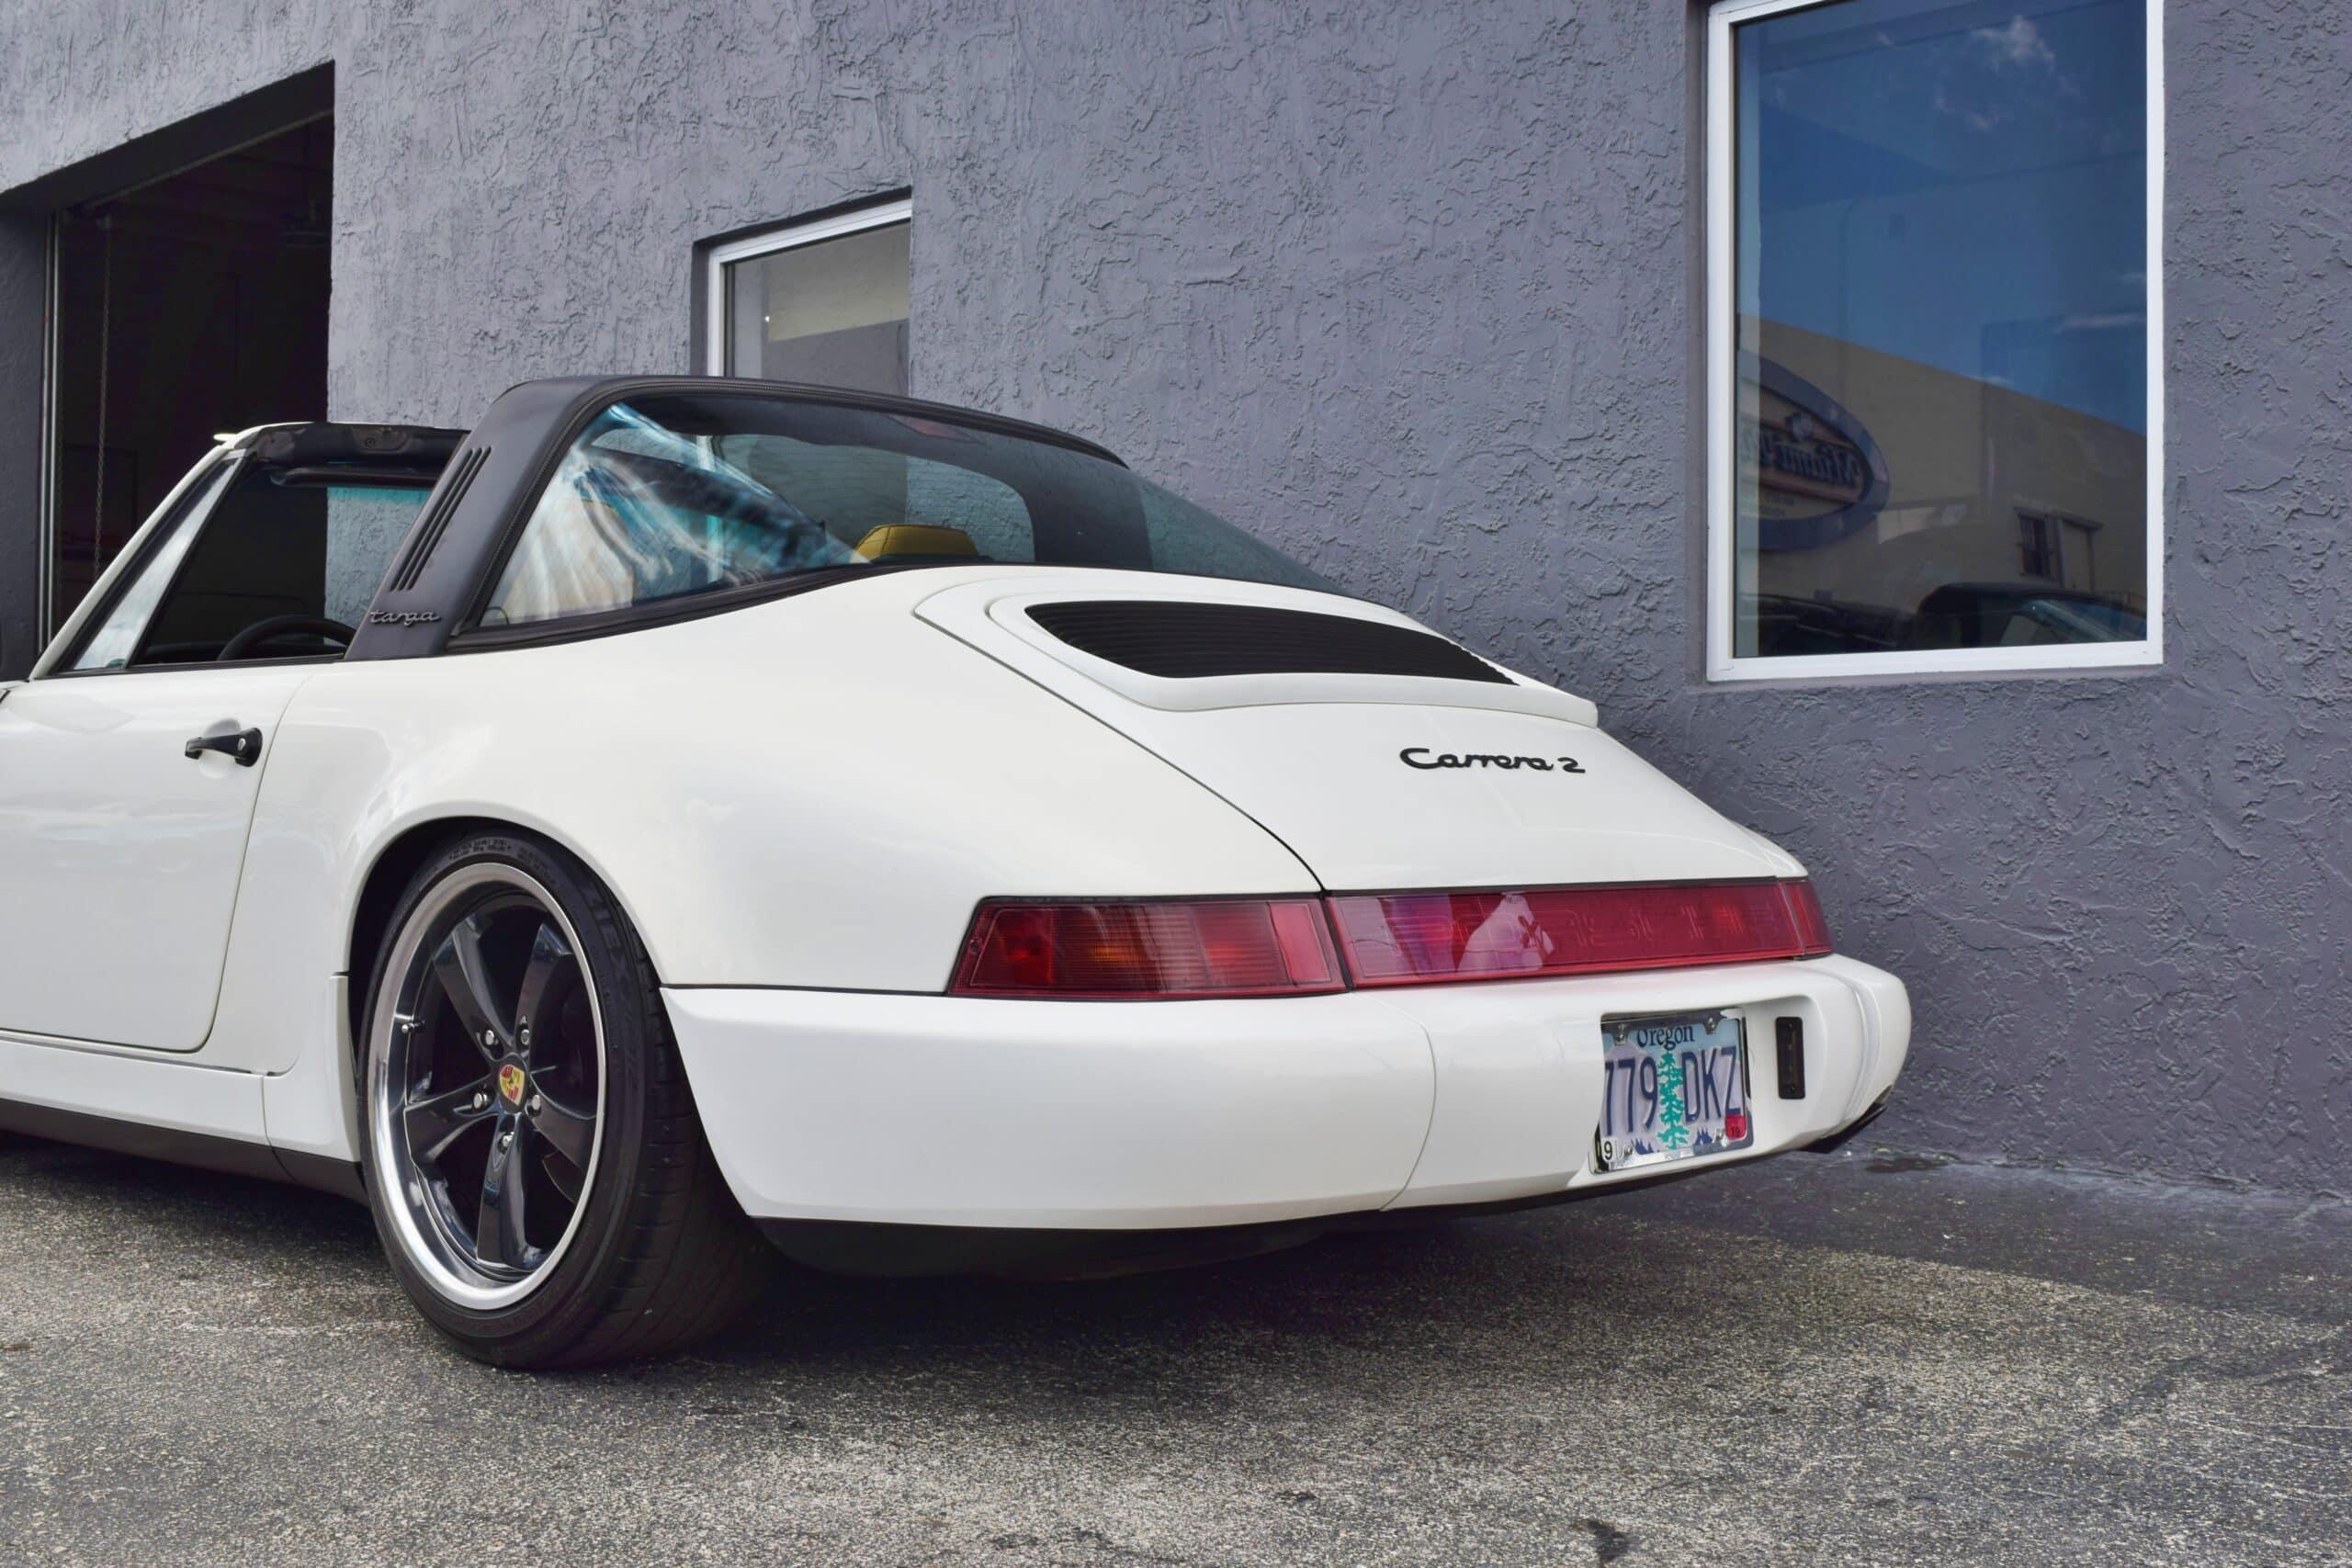 1990 Porsche 911 Targa 964 C2 Rare 1 of 158 – ONLY 71K MILES! 5 Speed Manual – Carrera 2 – Clean History